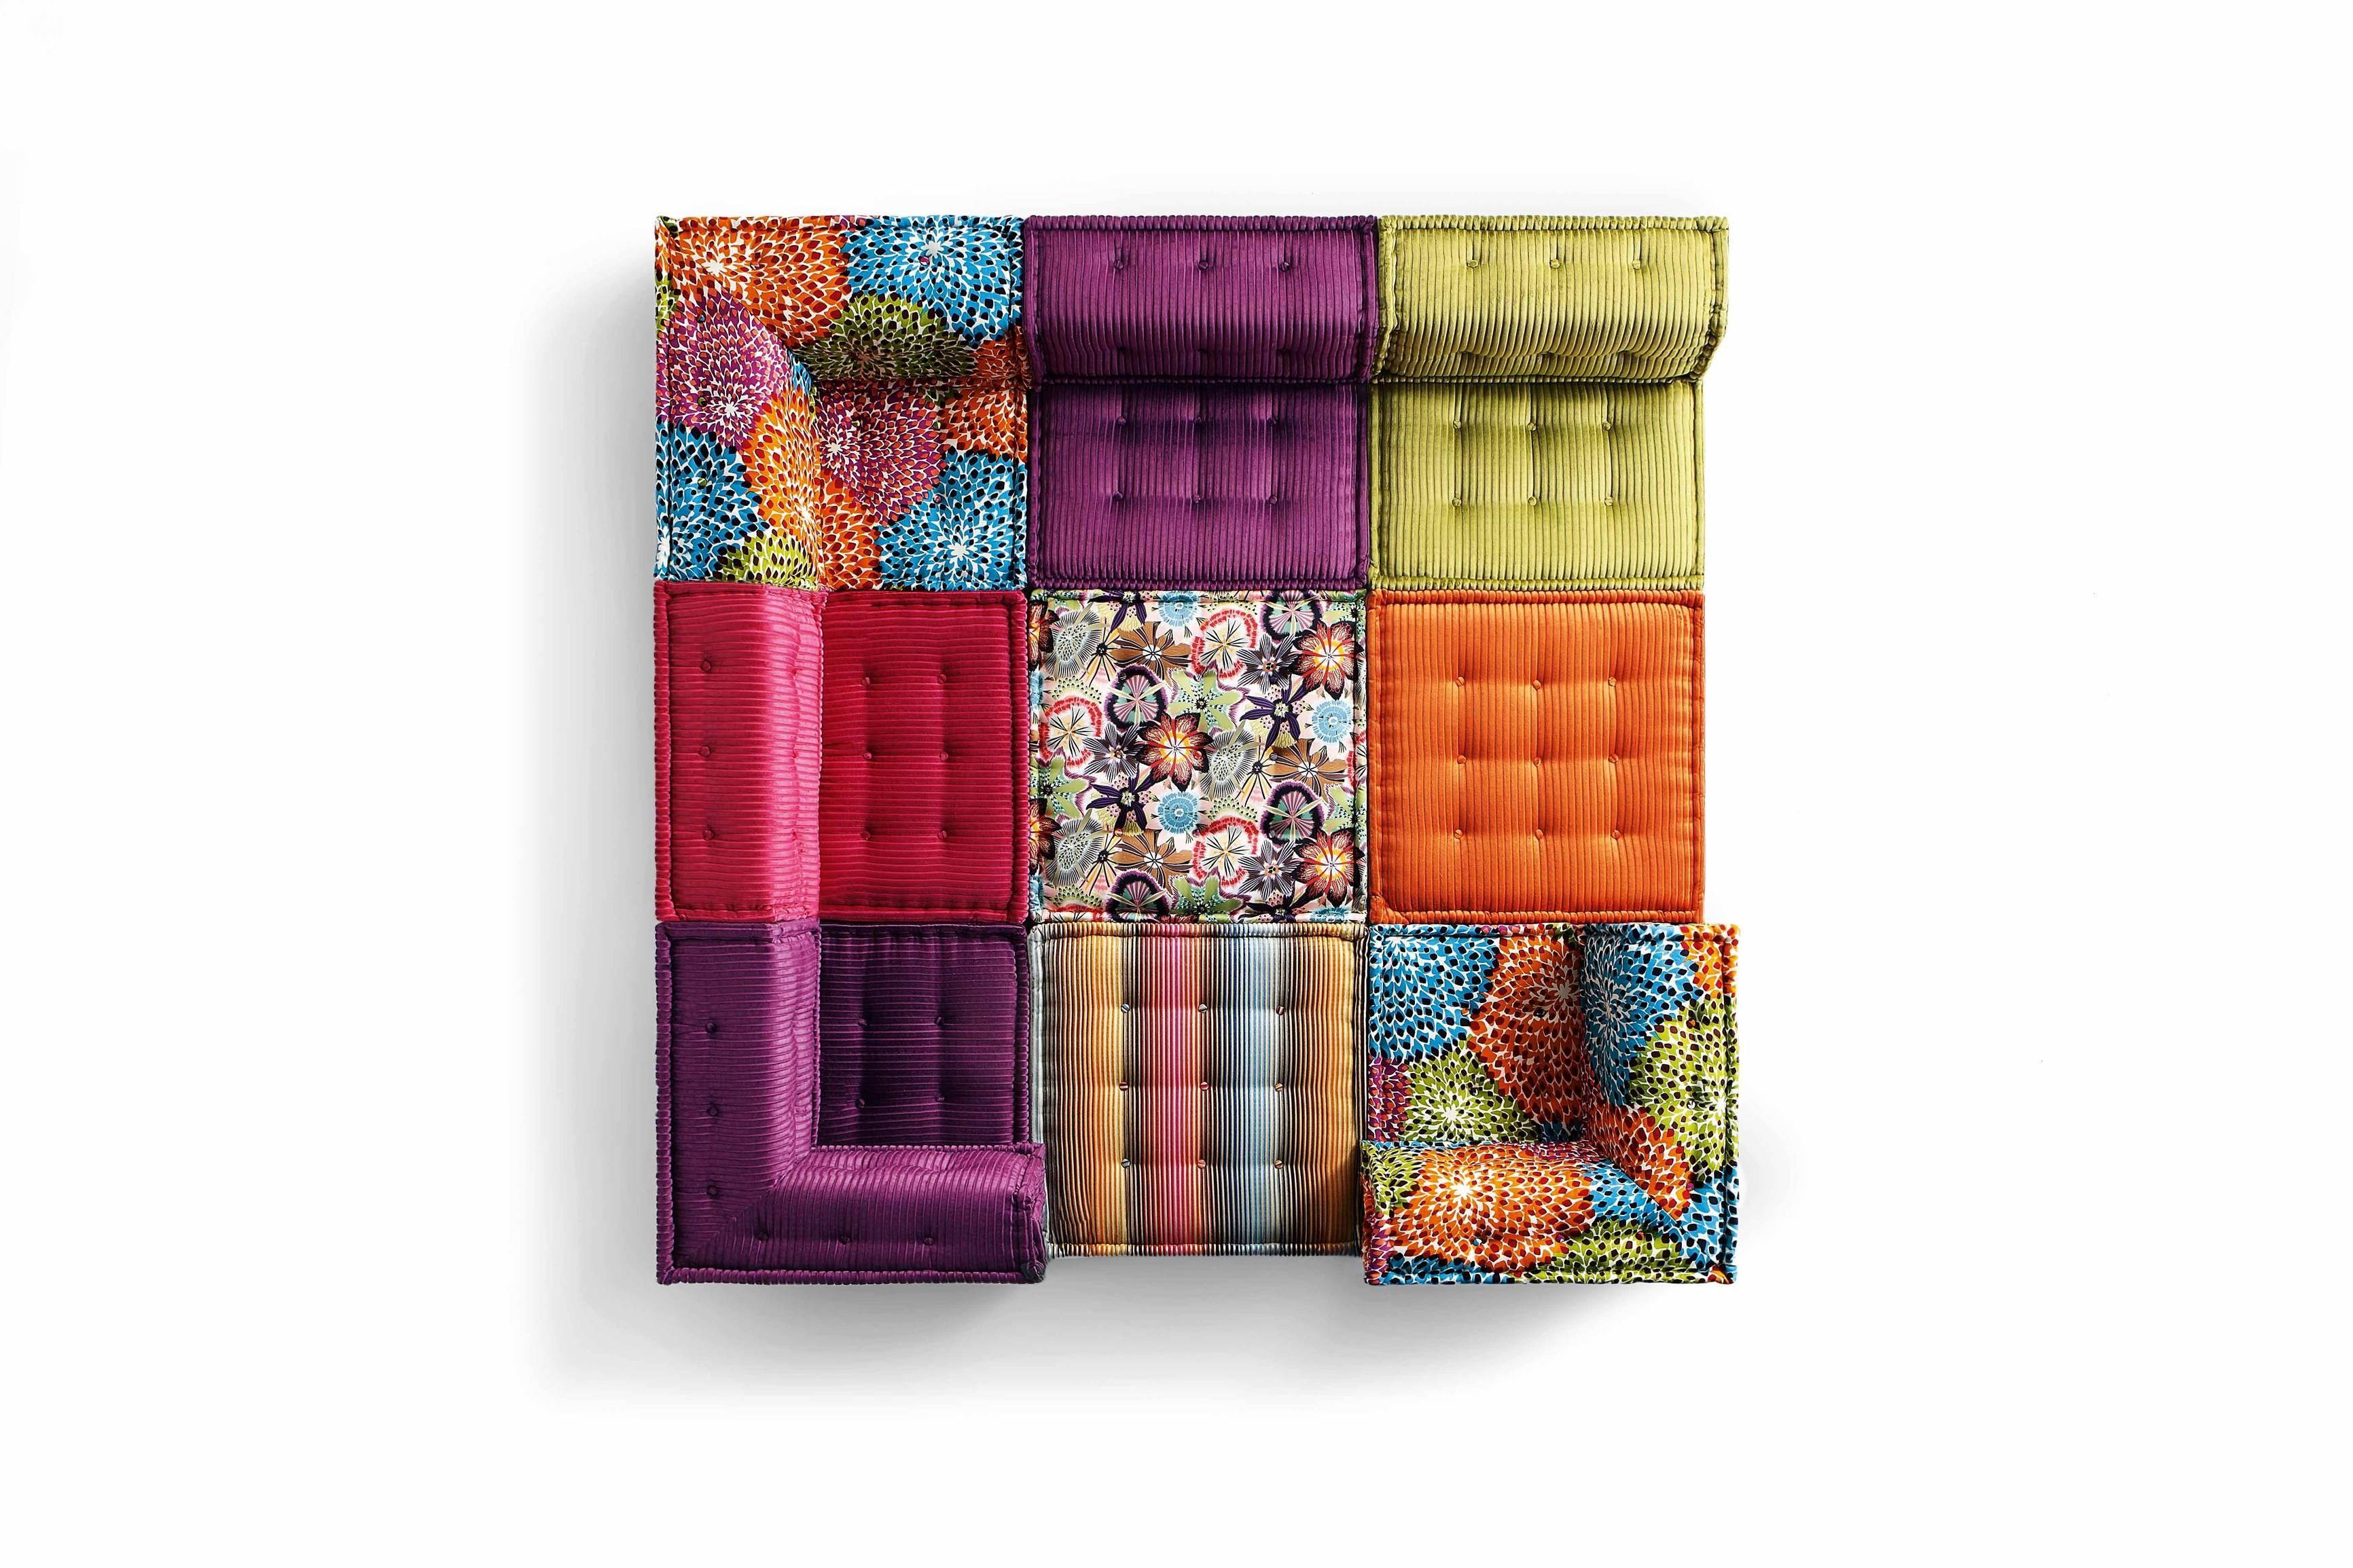 Sectional Fabric Sofa Mah Jong Missoni Homeroche Bobois Design regarding Roche Bobois Mah Jong Sofas (Image 13 of 15)